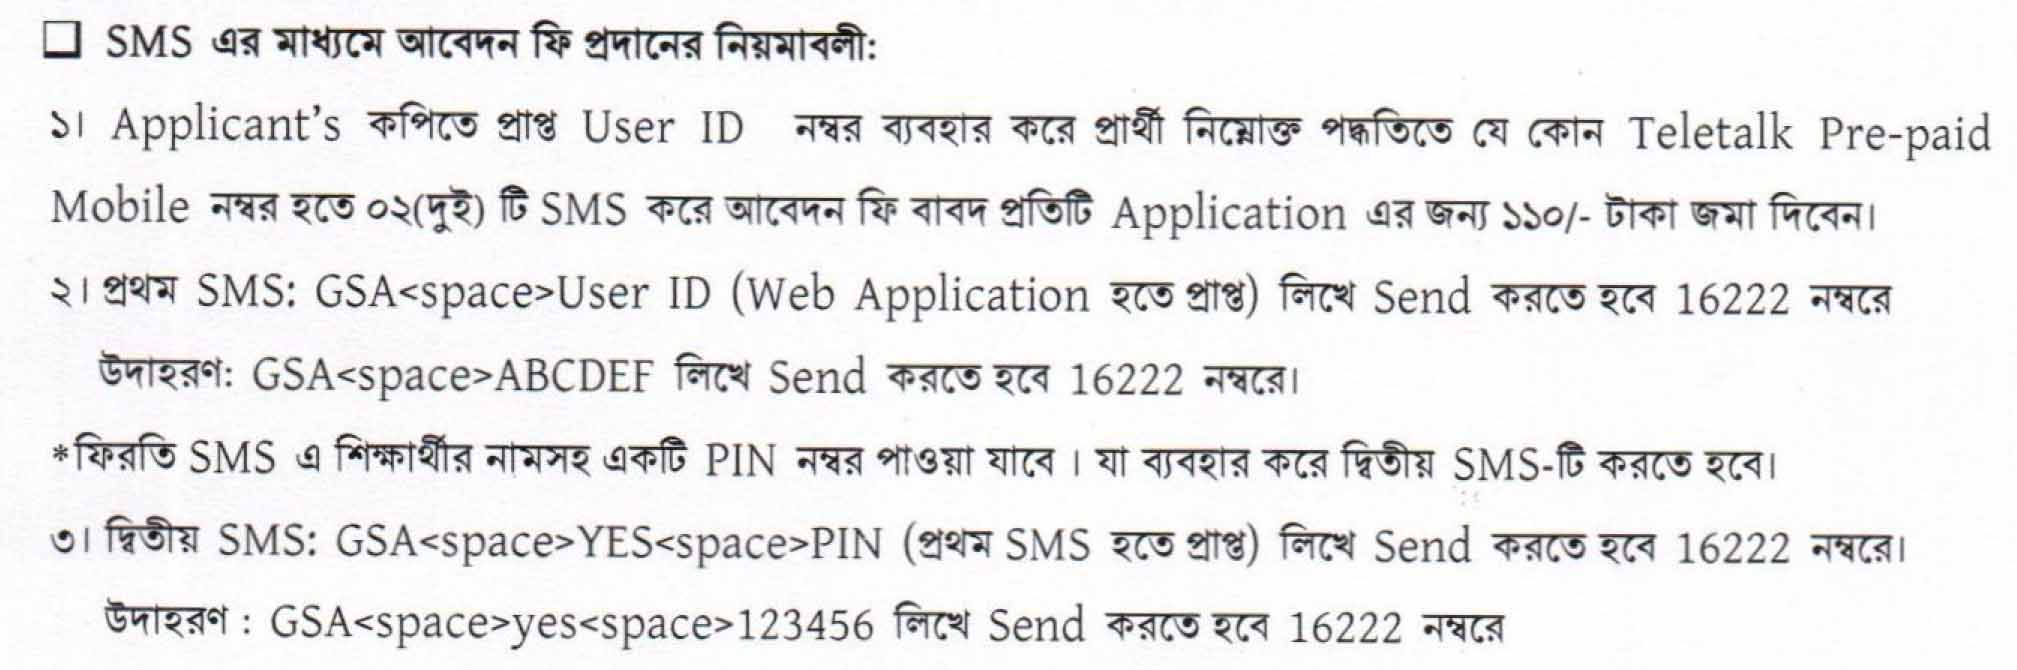 govt school teletalk payment system